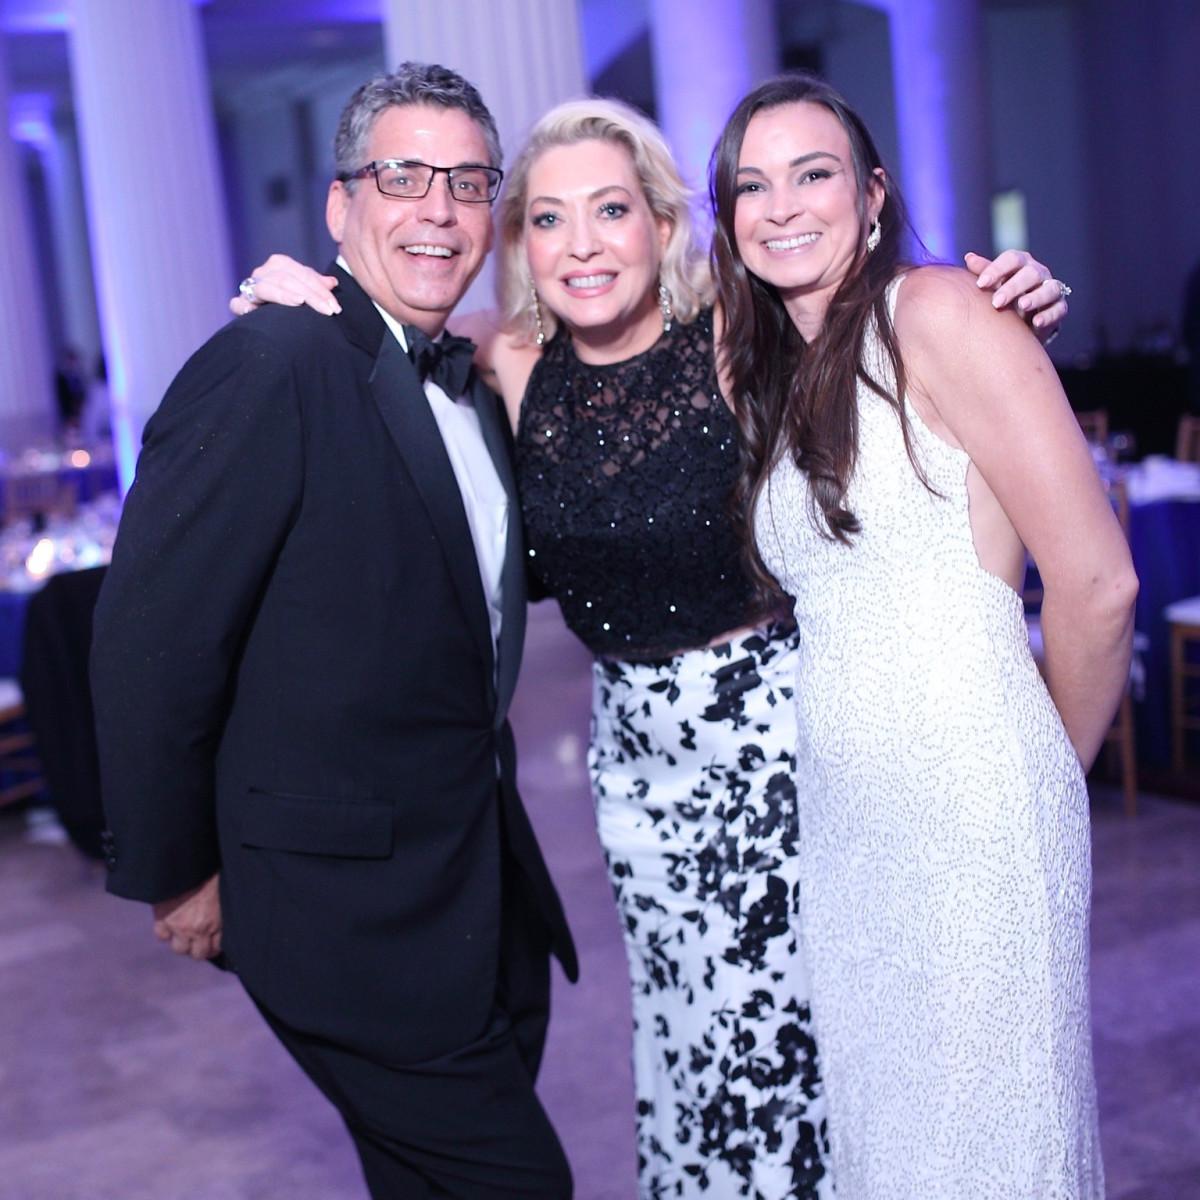 Enrique Salinas, Lily Salinas, Francesca Salinas at Denali Gala